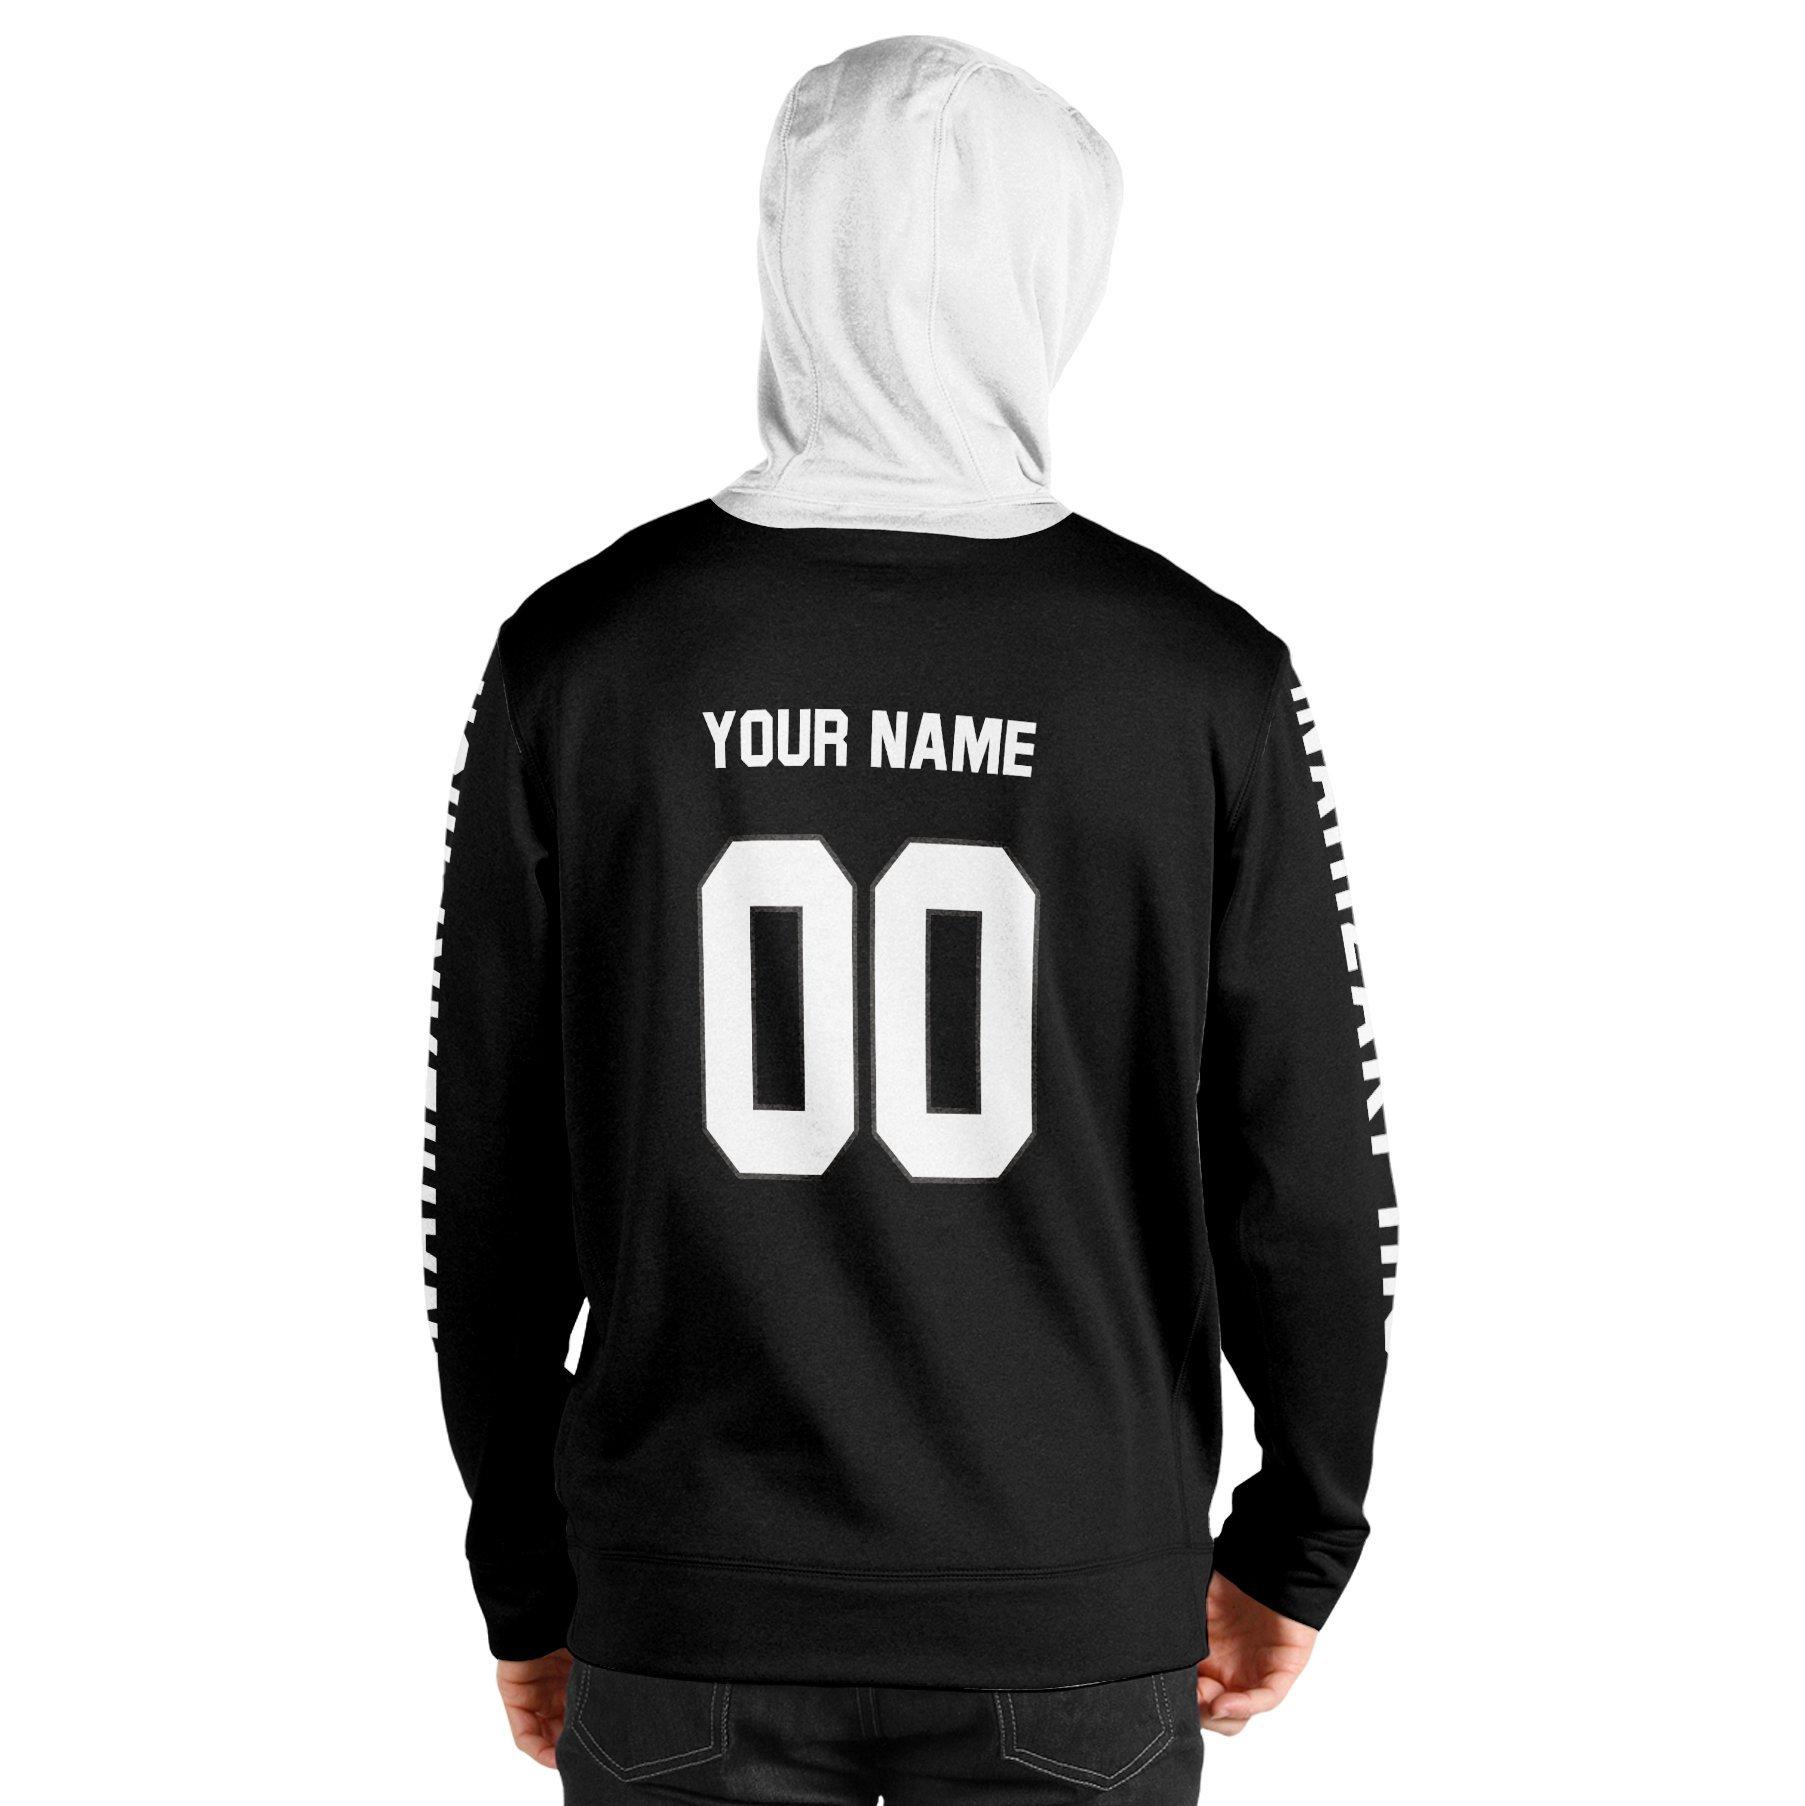 personalized team inarizaki unisex pullover hoodie 500569 - Otaku Treat